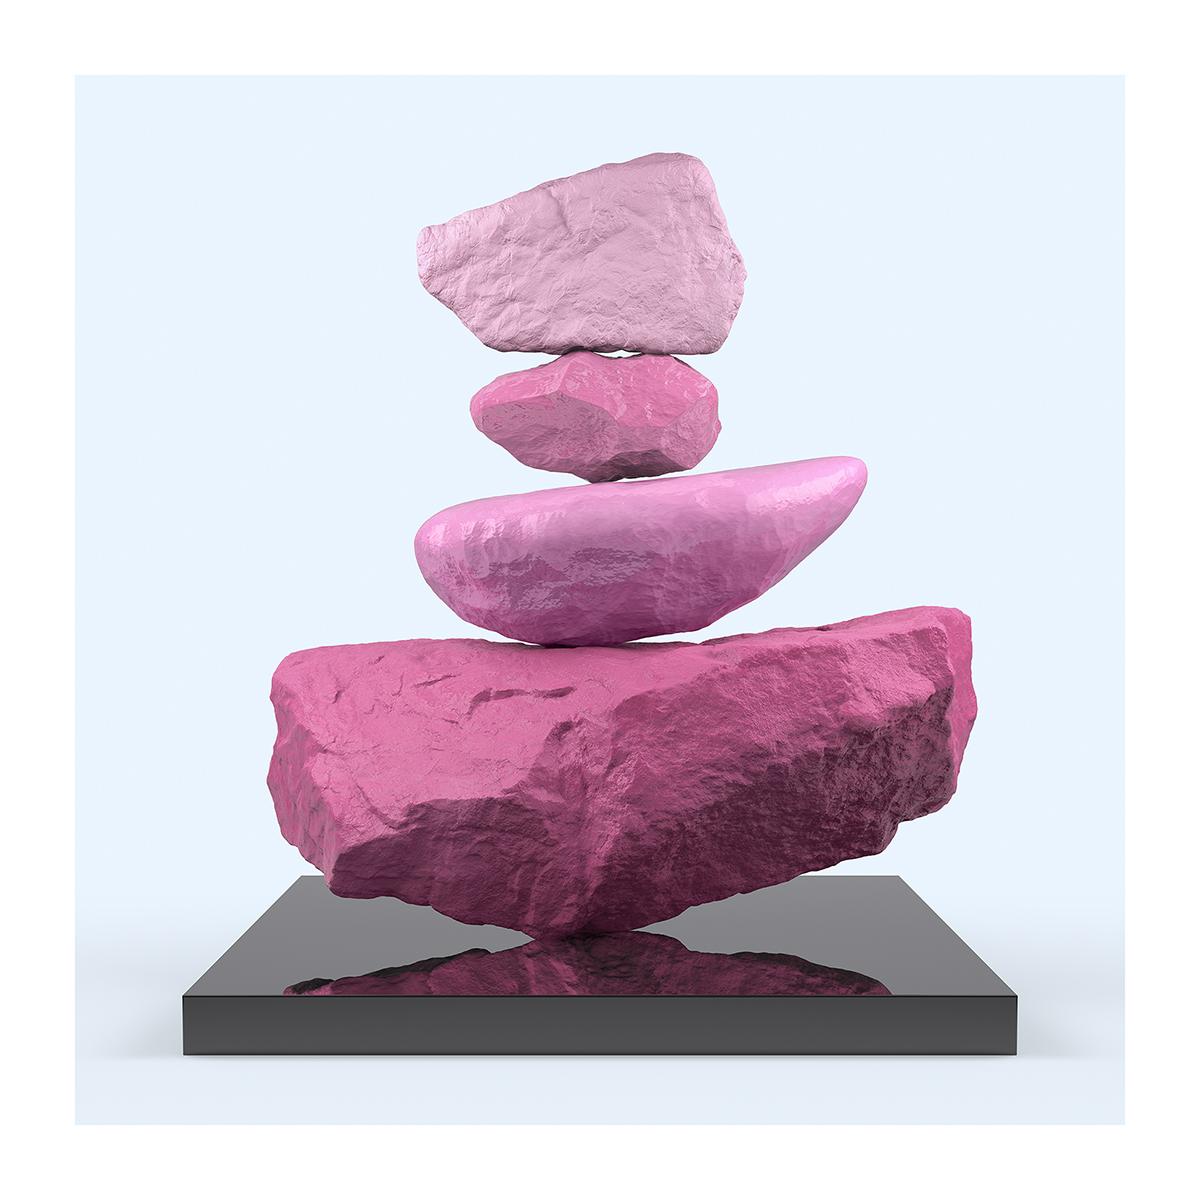 145 I will not Make any more Boring Art XXIV 001 - 2021 - I will not Make any more Boring Art. XXIV. (Rock Balancing - The Rose Period)